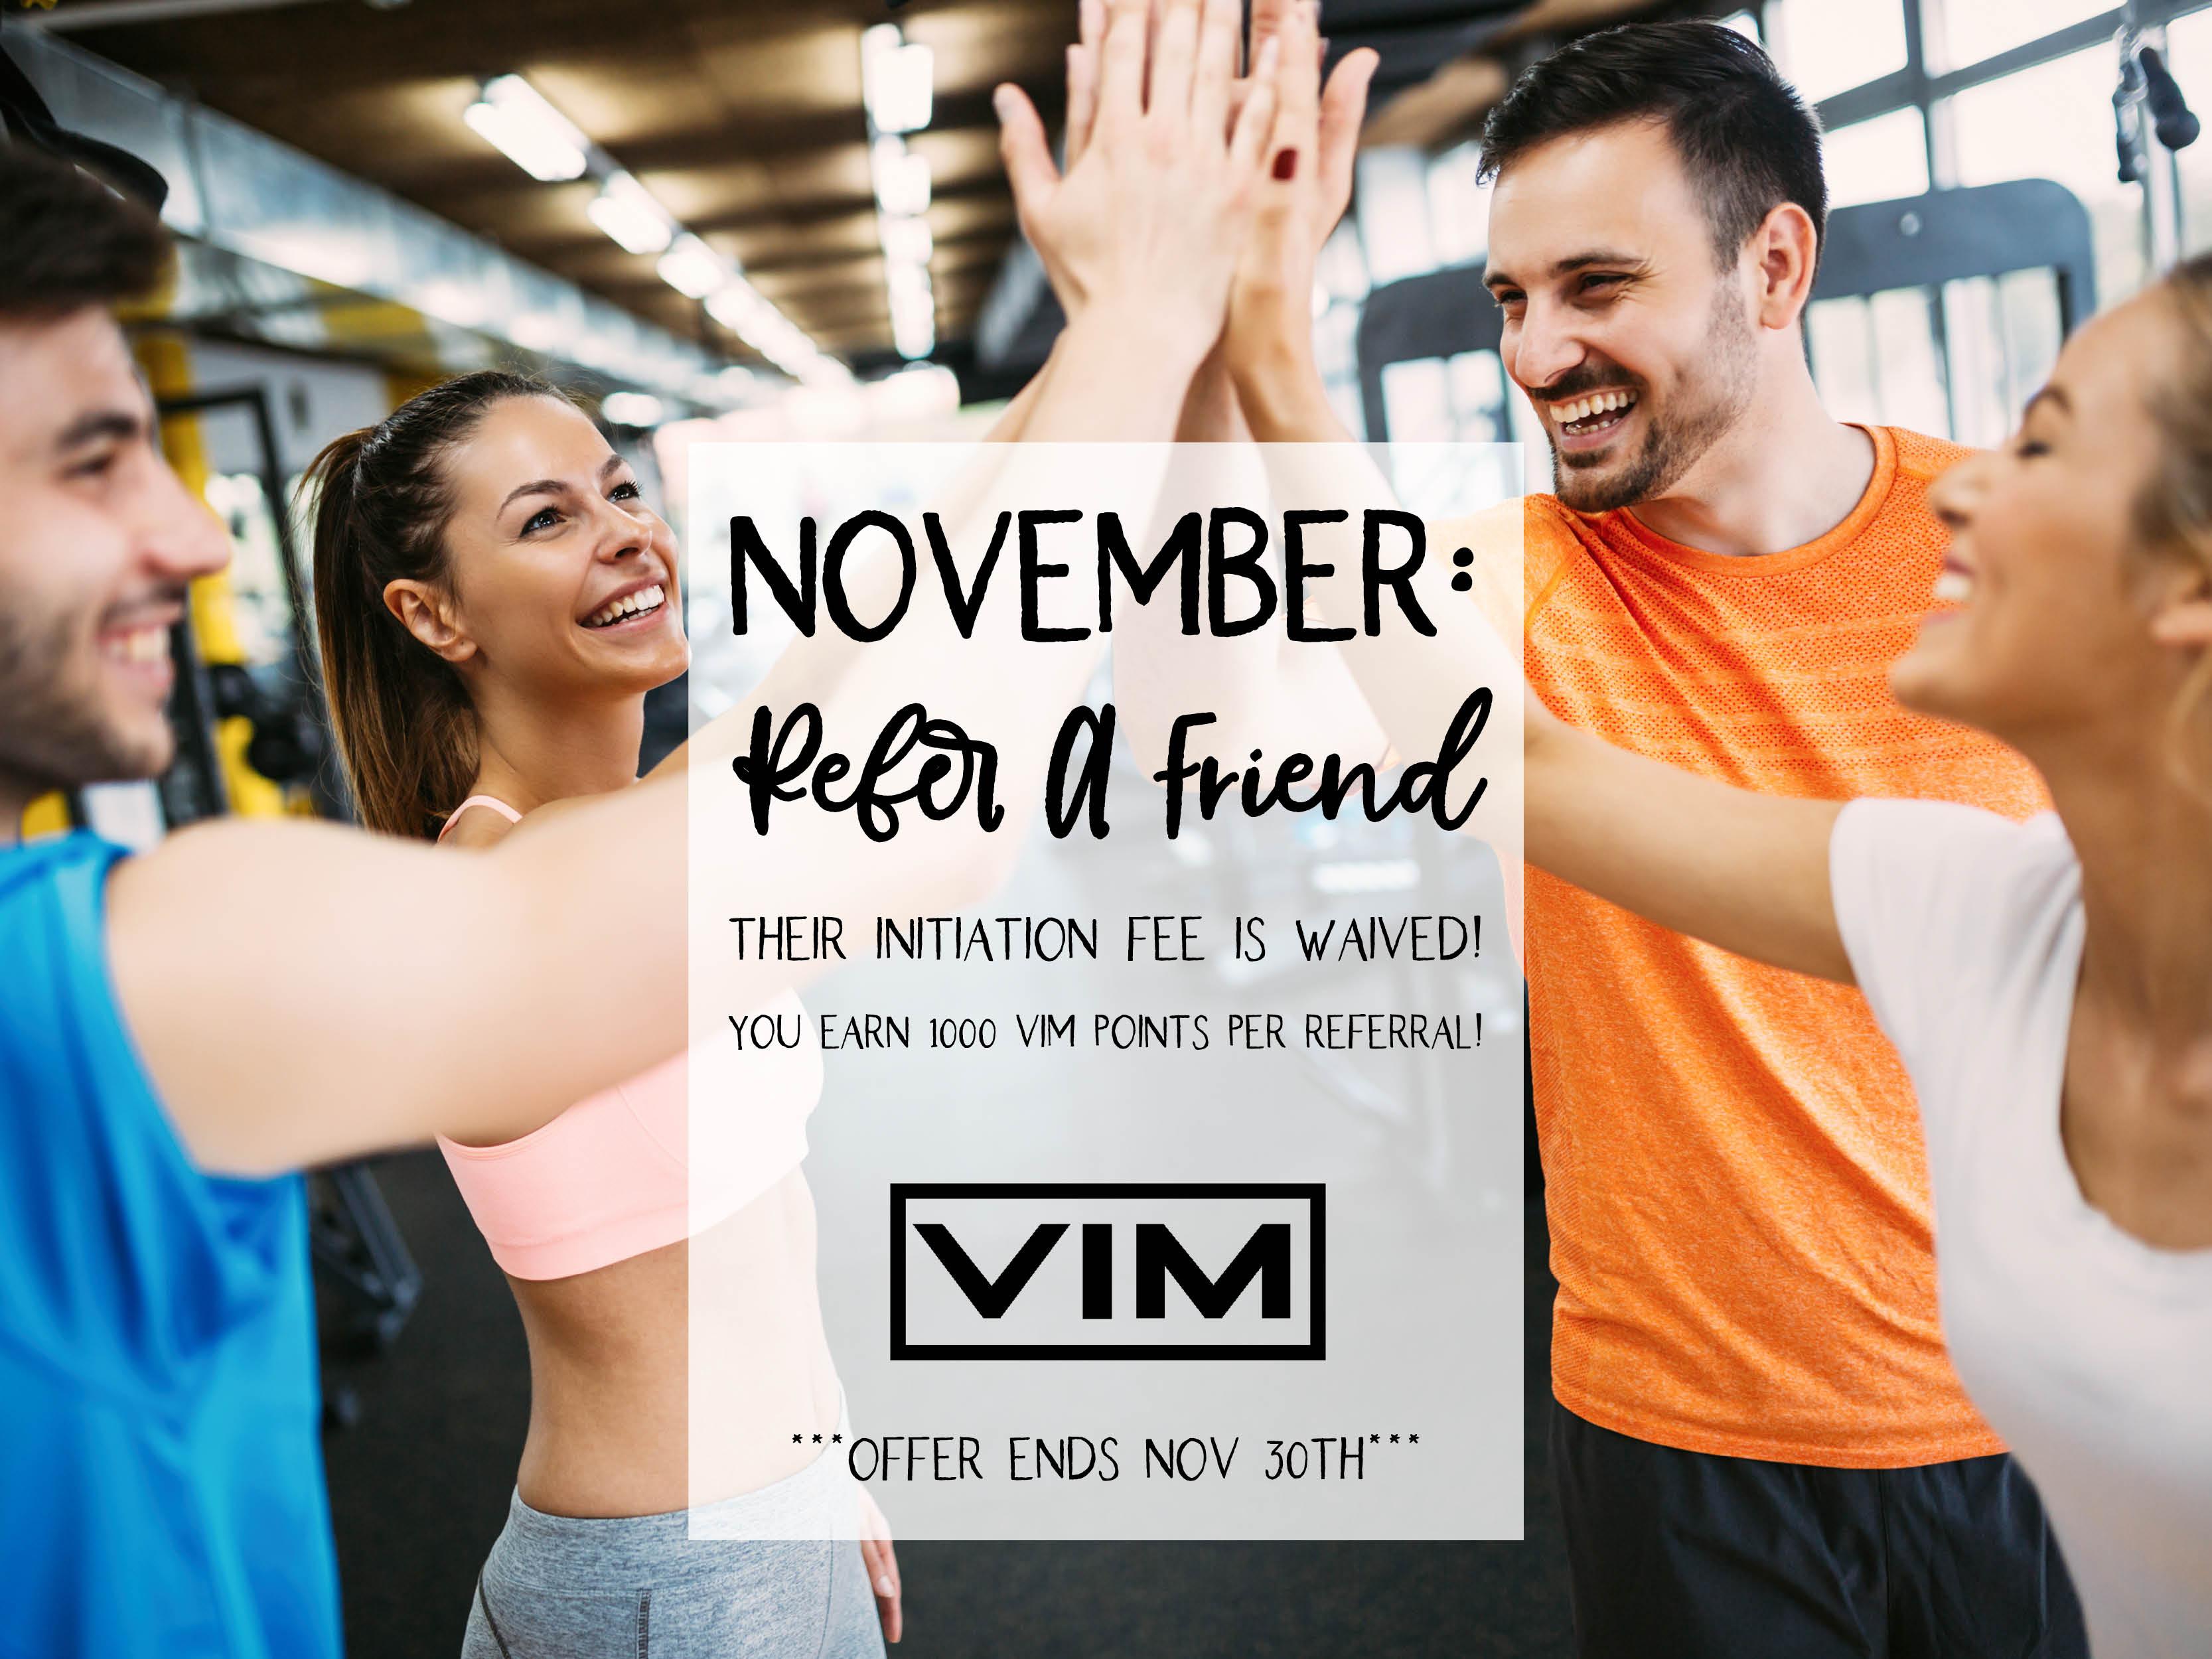 November Refer A Friend Bonus